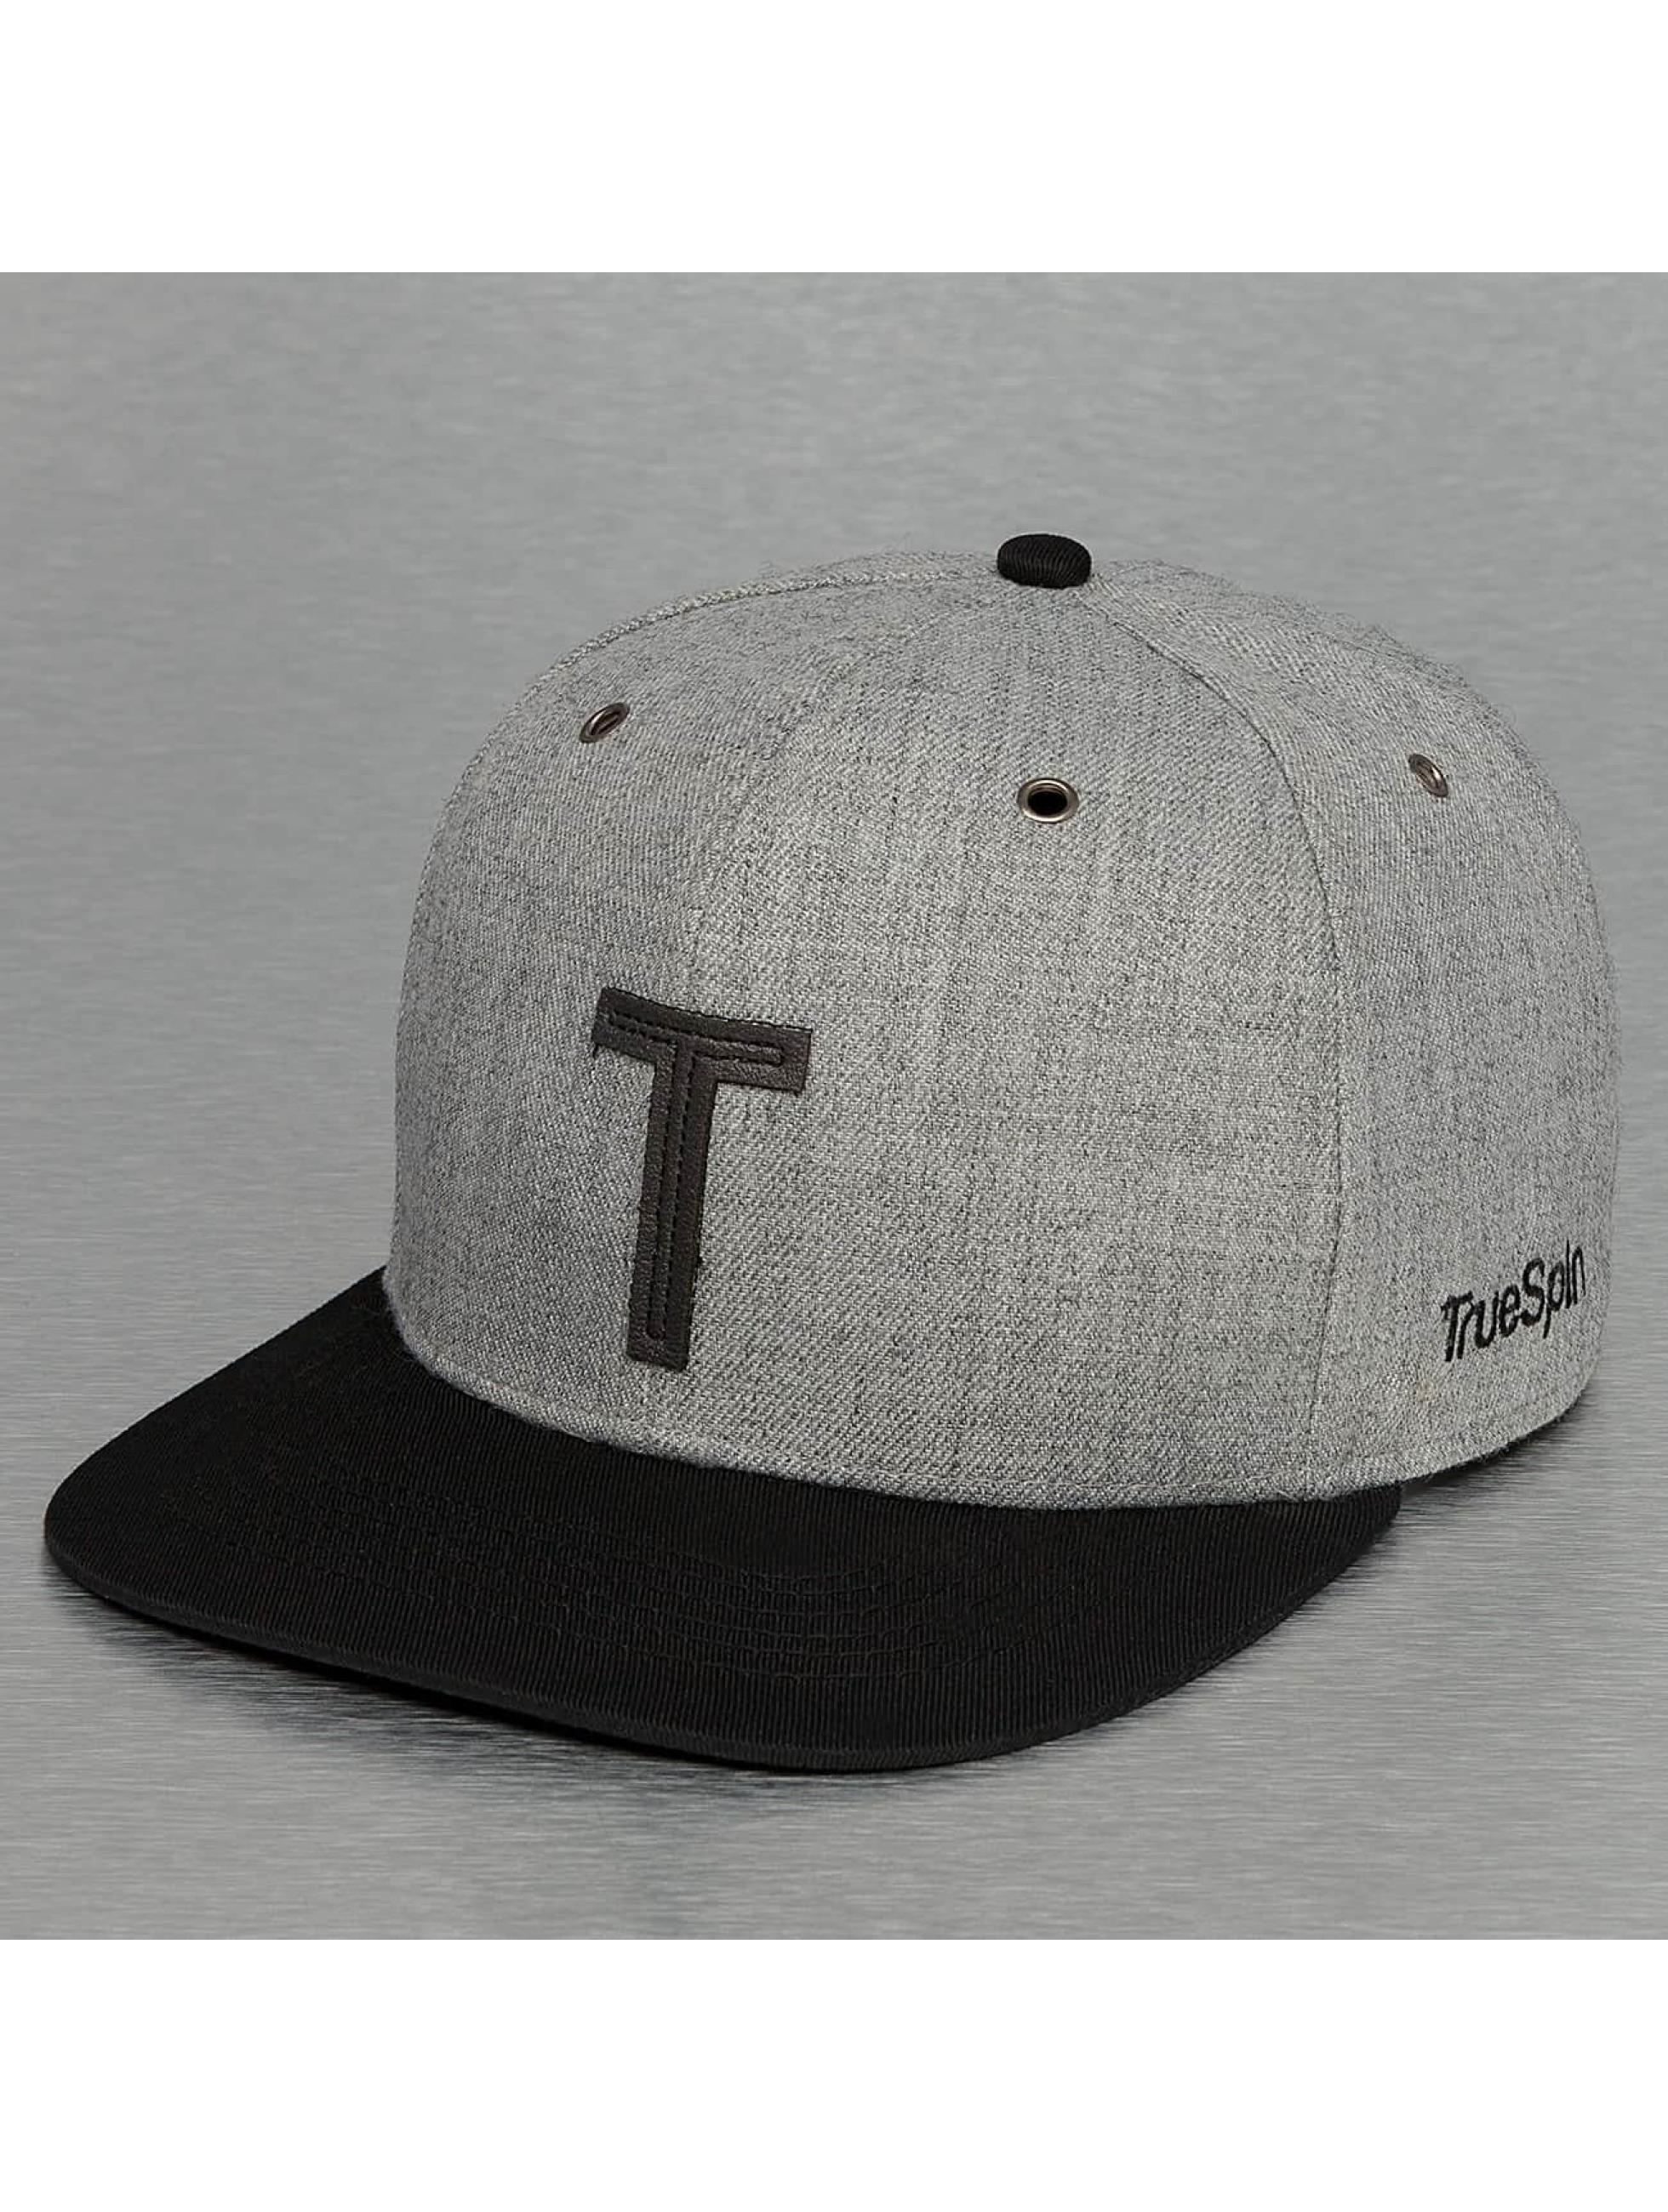 TrueSpin Casquette Snapback & Strapback ABC-T Wool gris